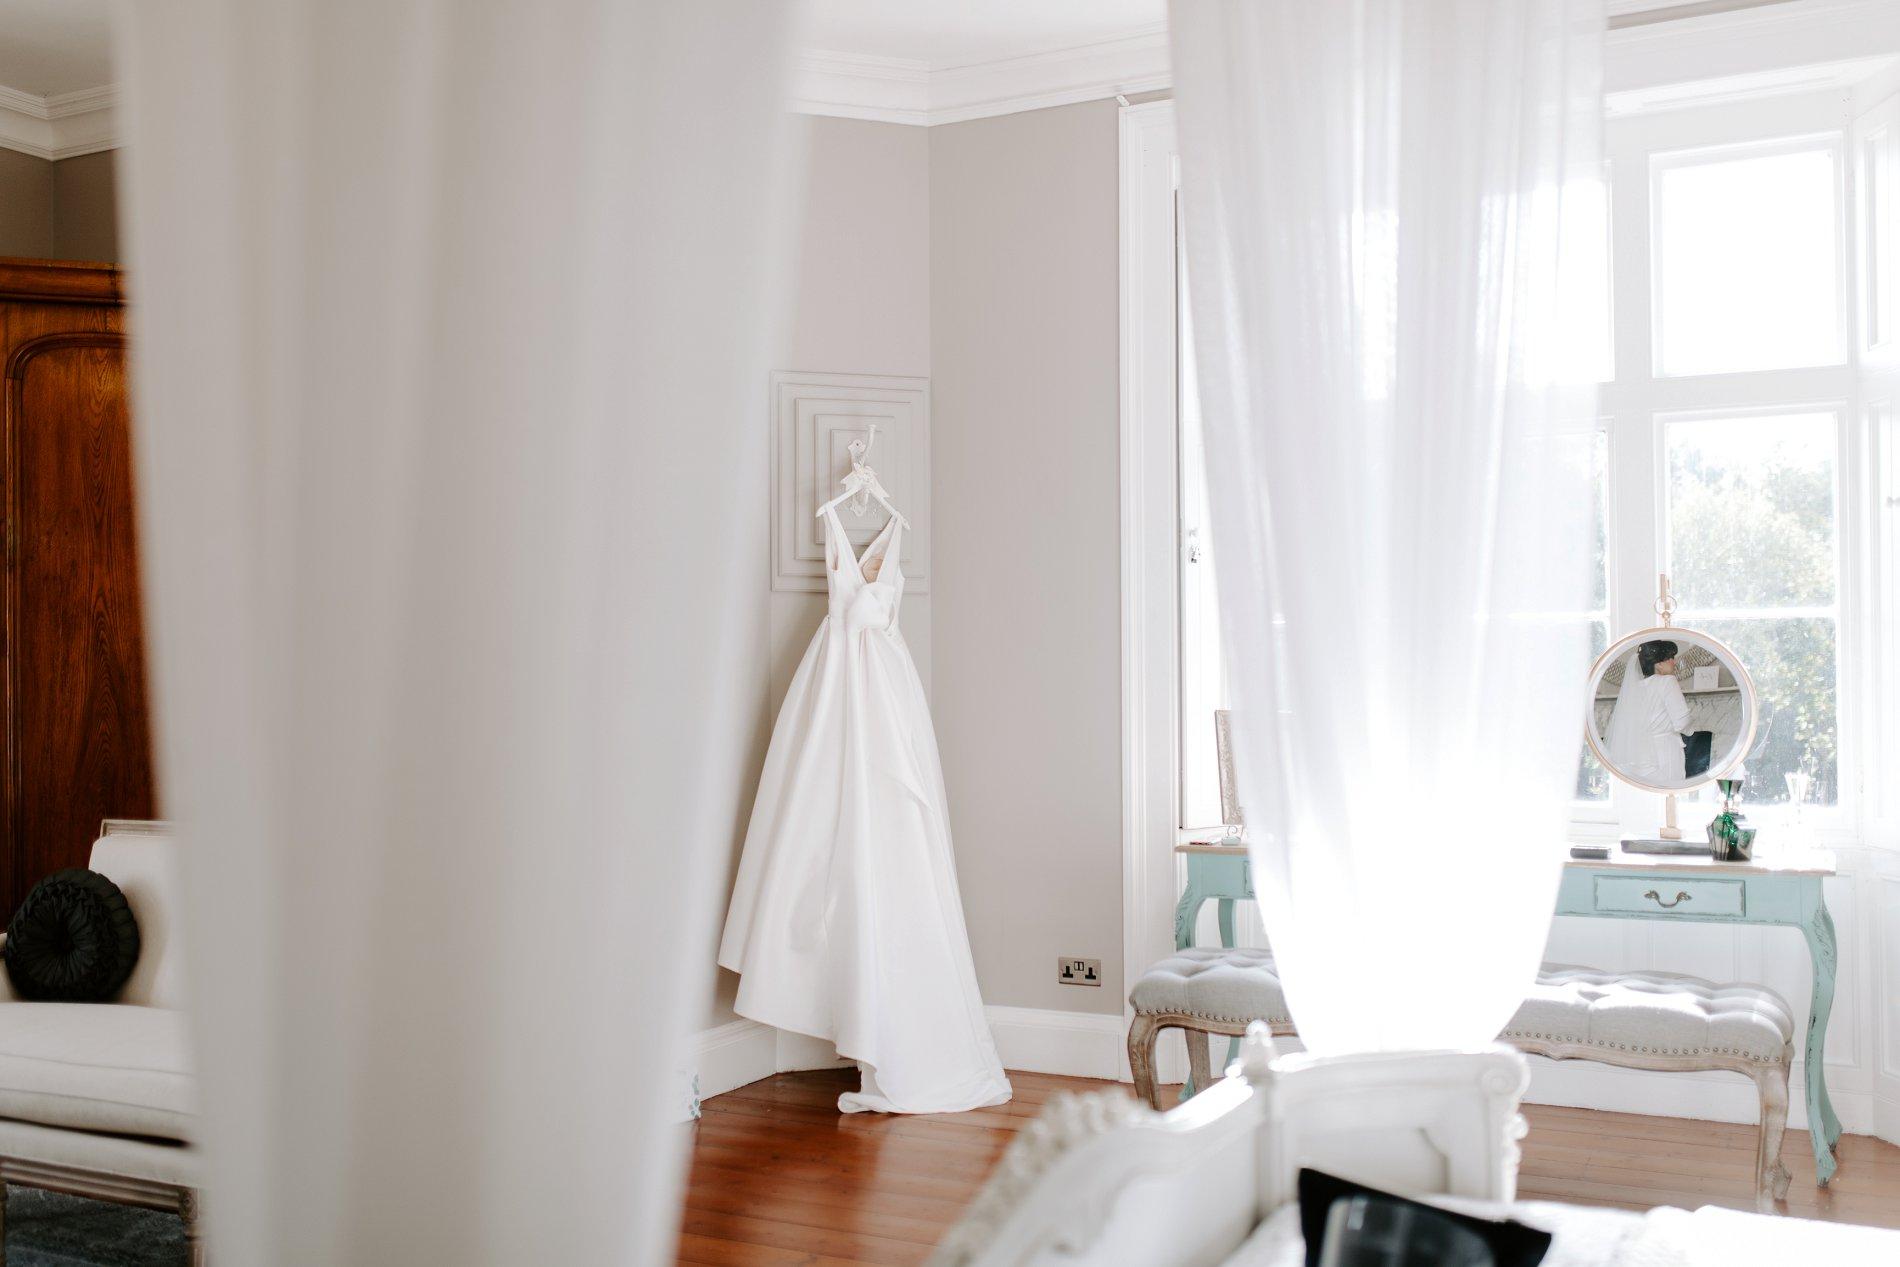 An Elegant White Wedding at Thicket Priory (c) Carla Whittingham Photography (25)